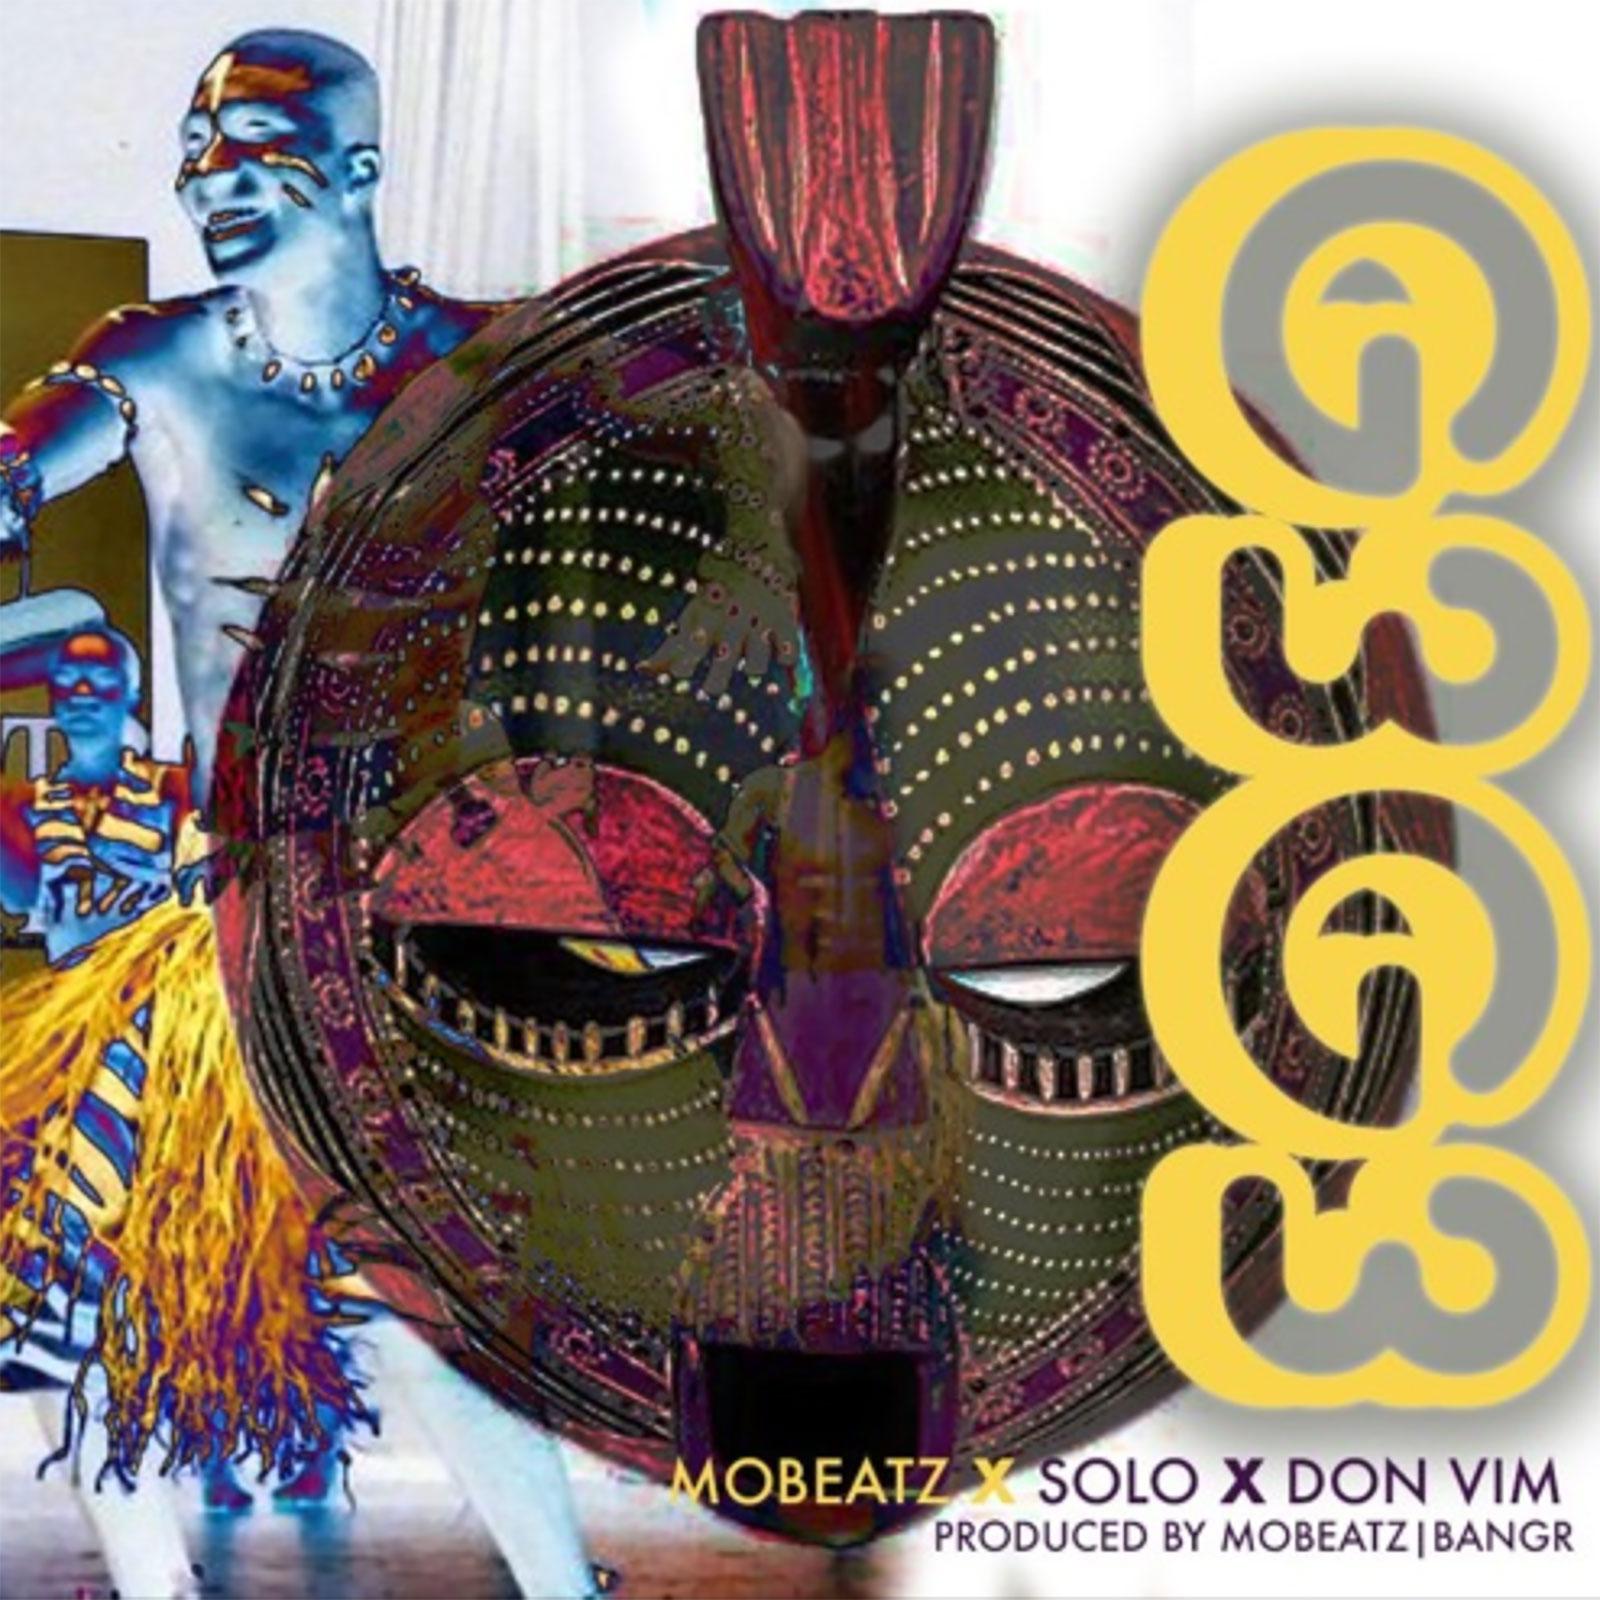 G3g3 by Mobeatz feat. Solo & Don Vim